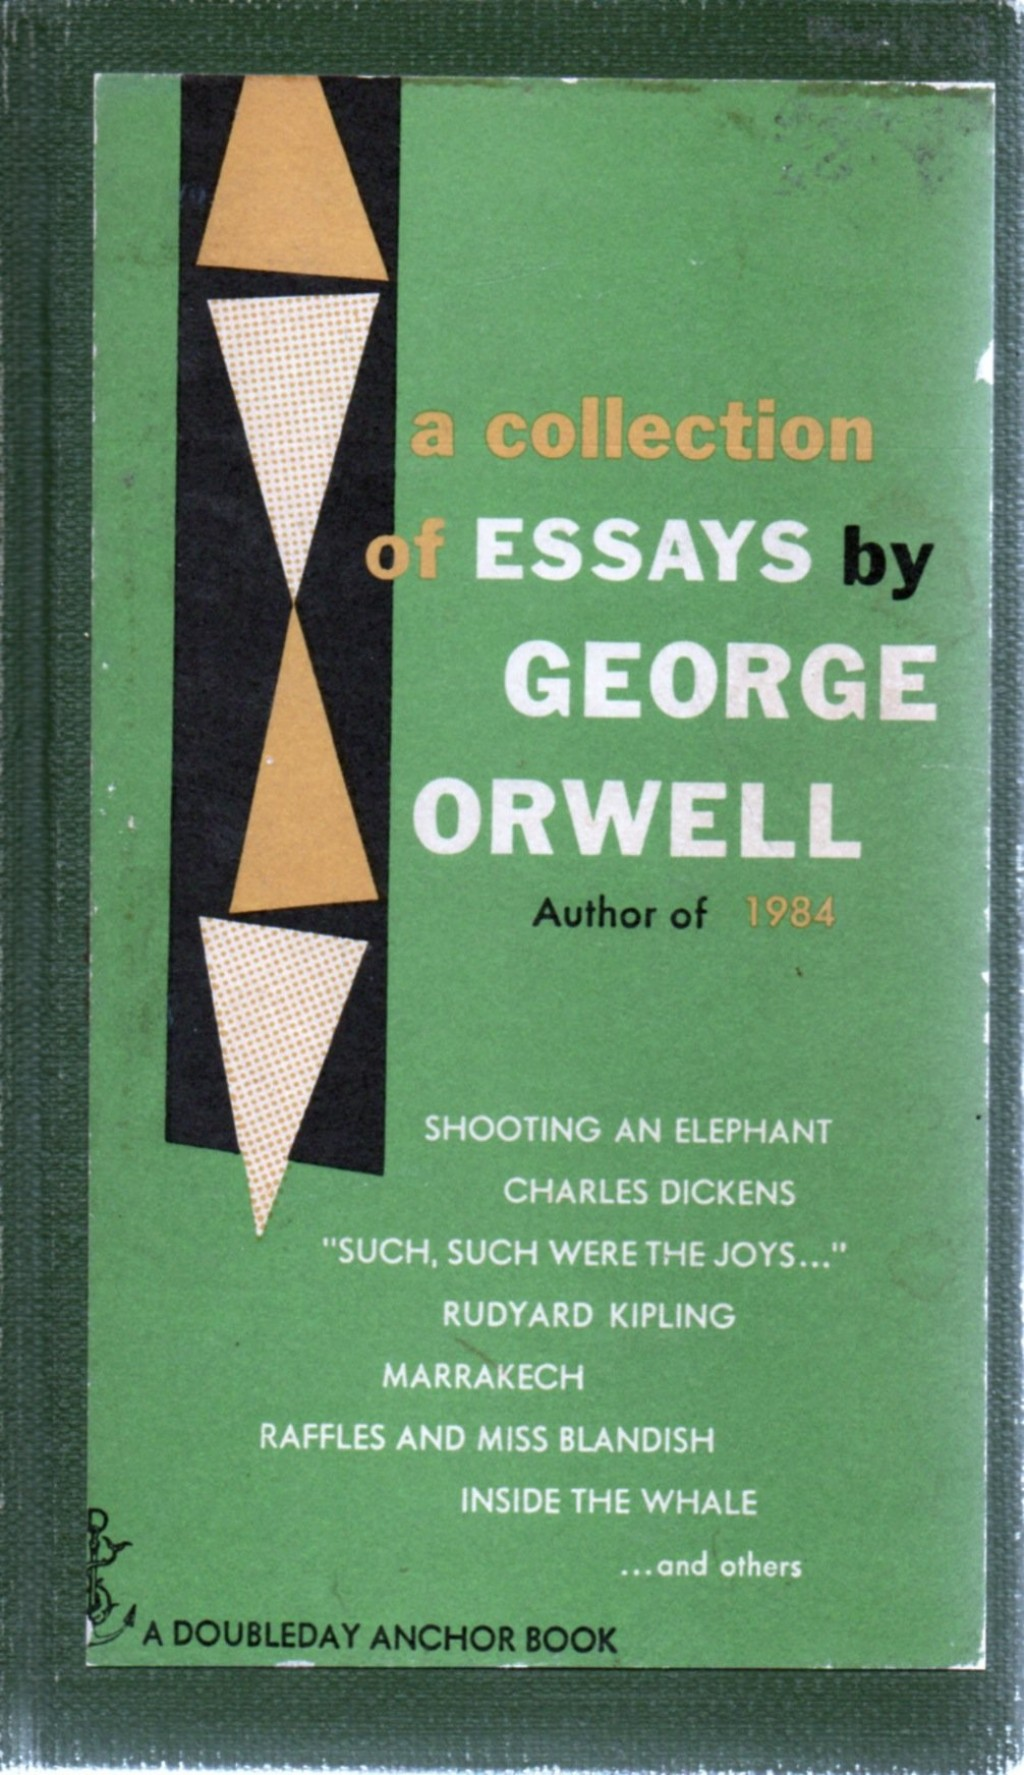 009 George Orwell Essays Essay Example Frightening Everyman's Library Summary Bookshop Memories Large